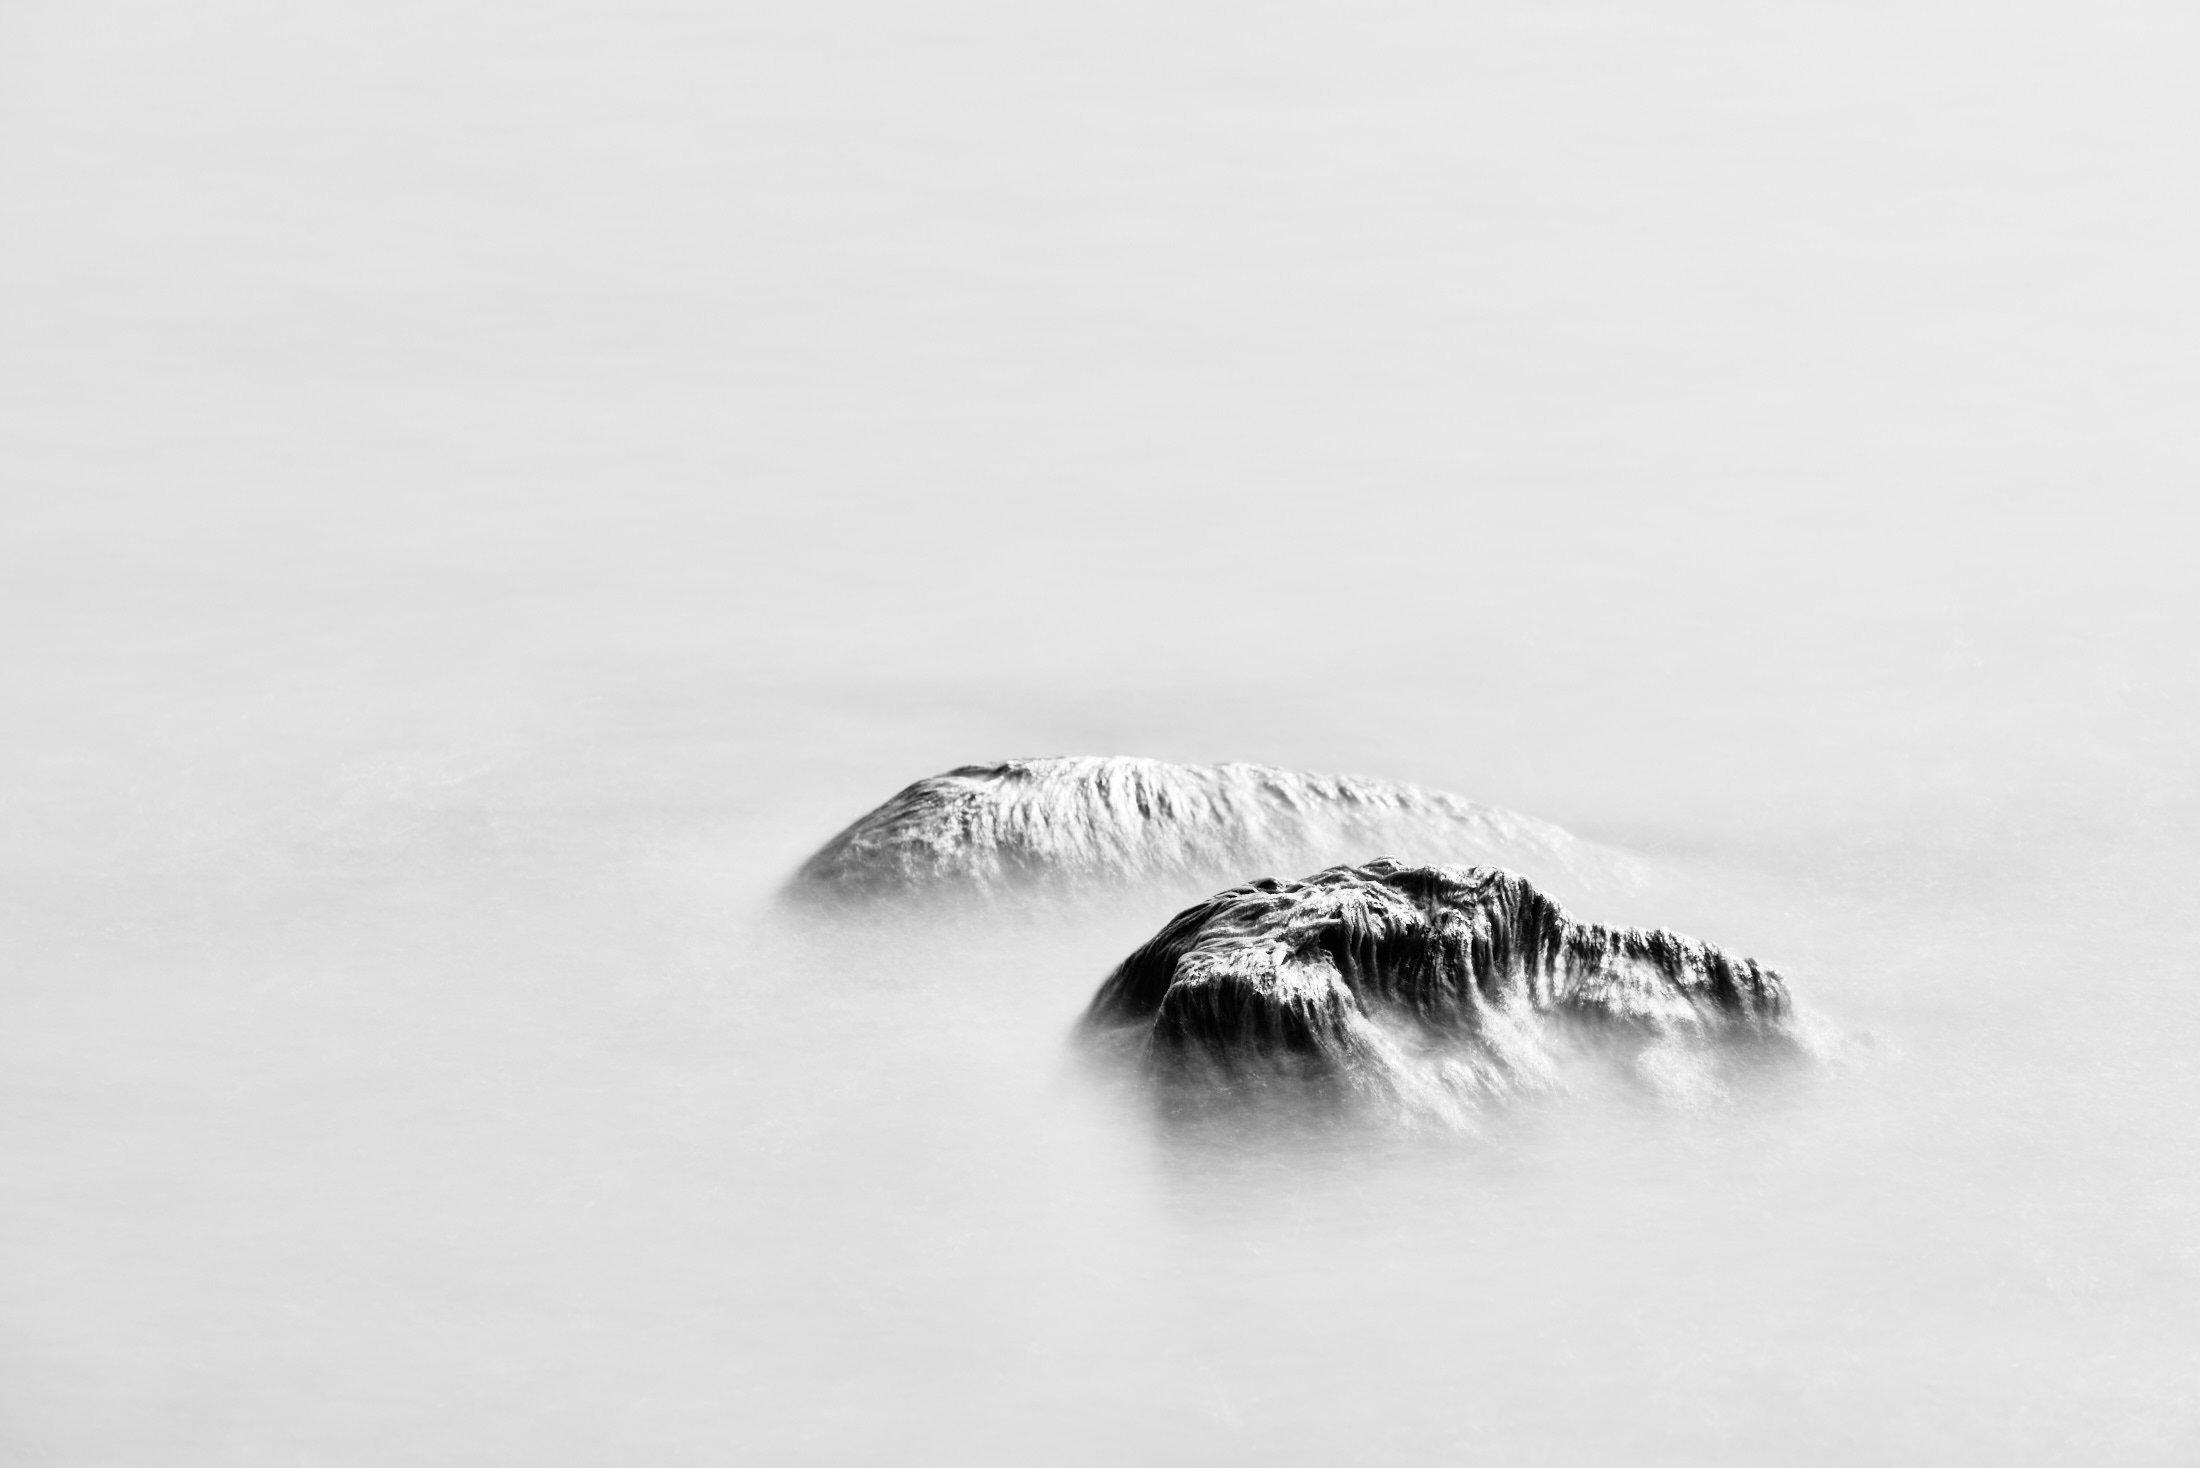 Mountains of the Sea III, 2016